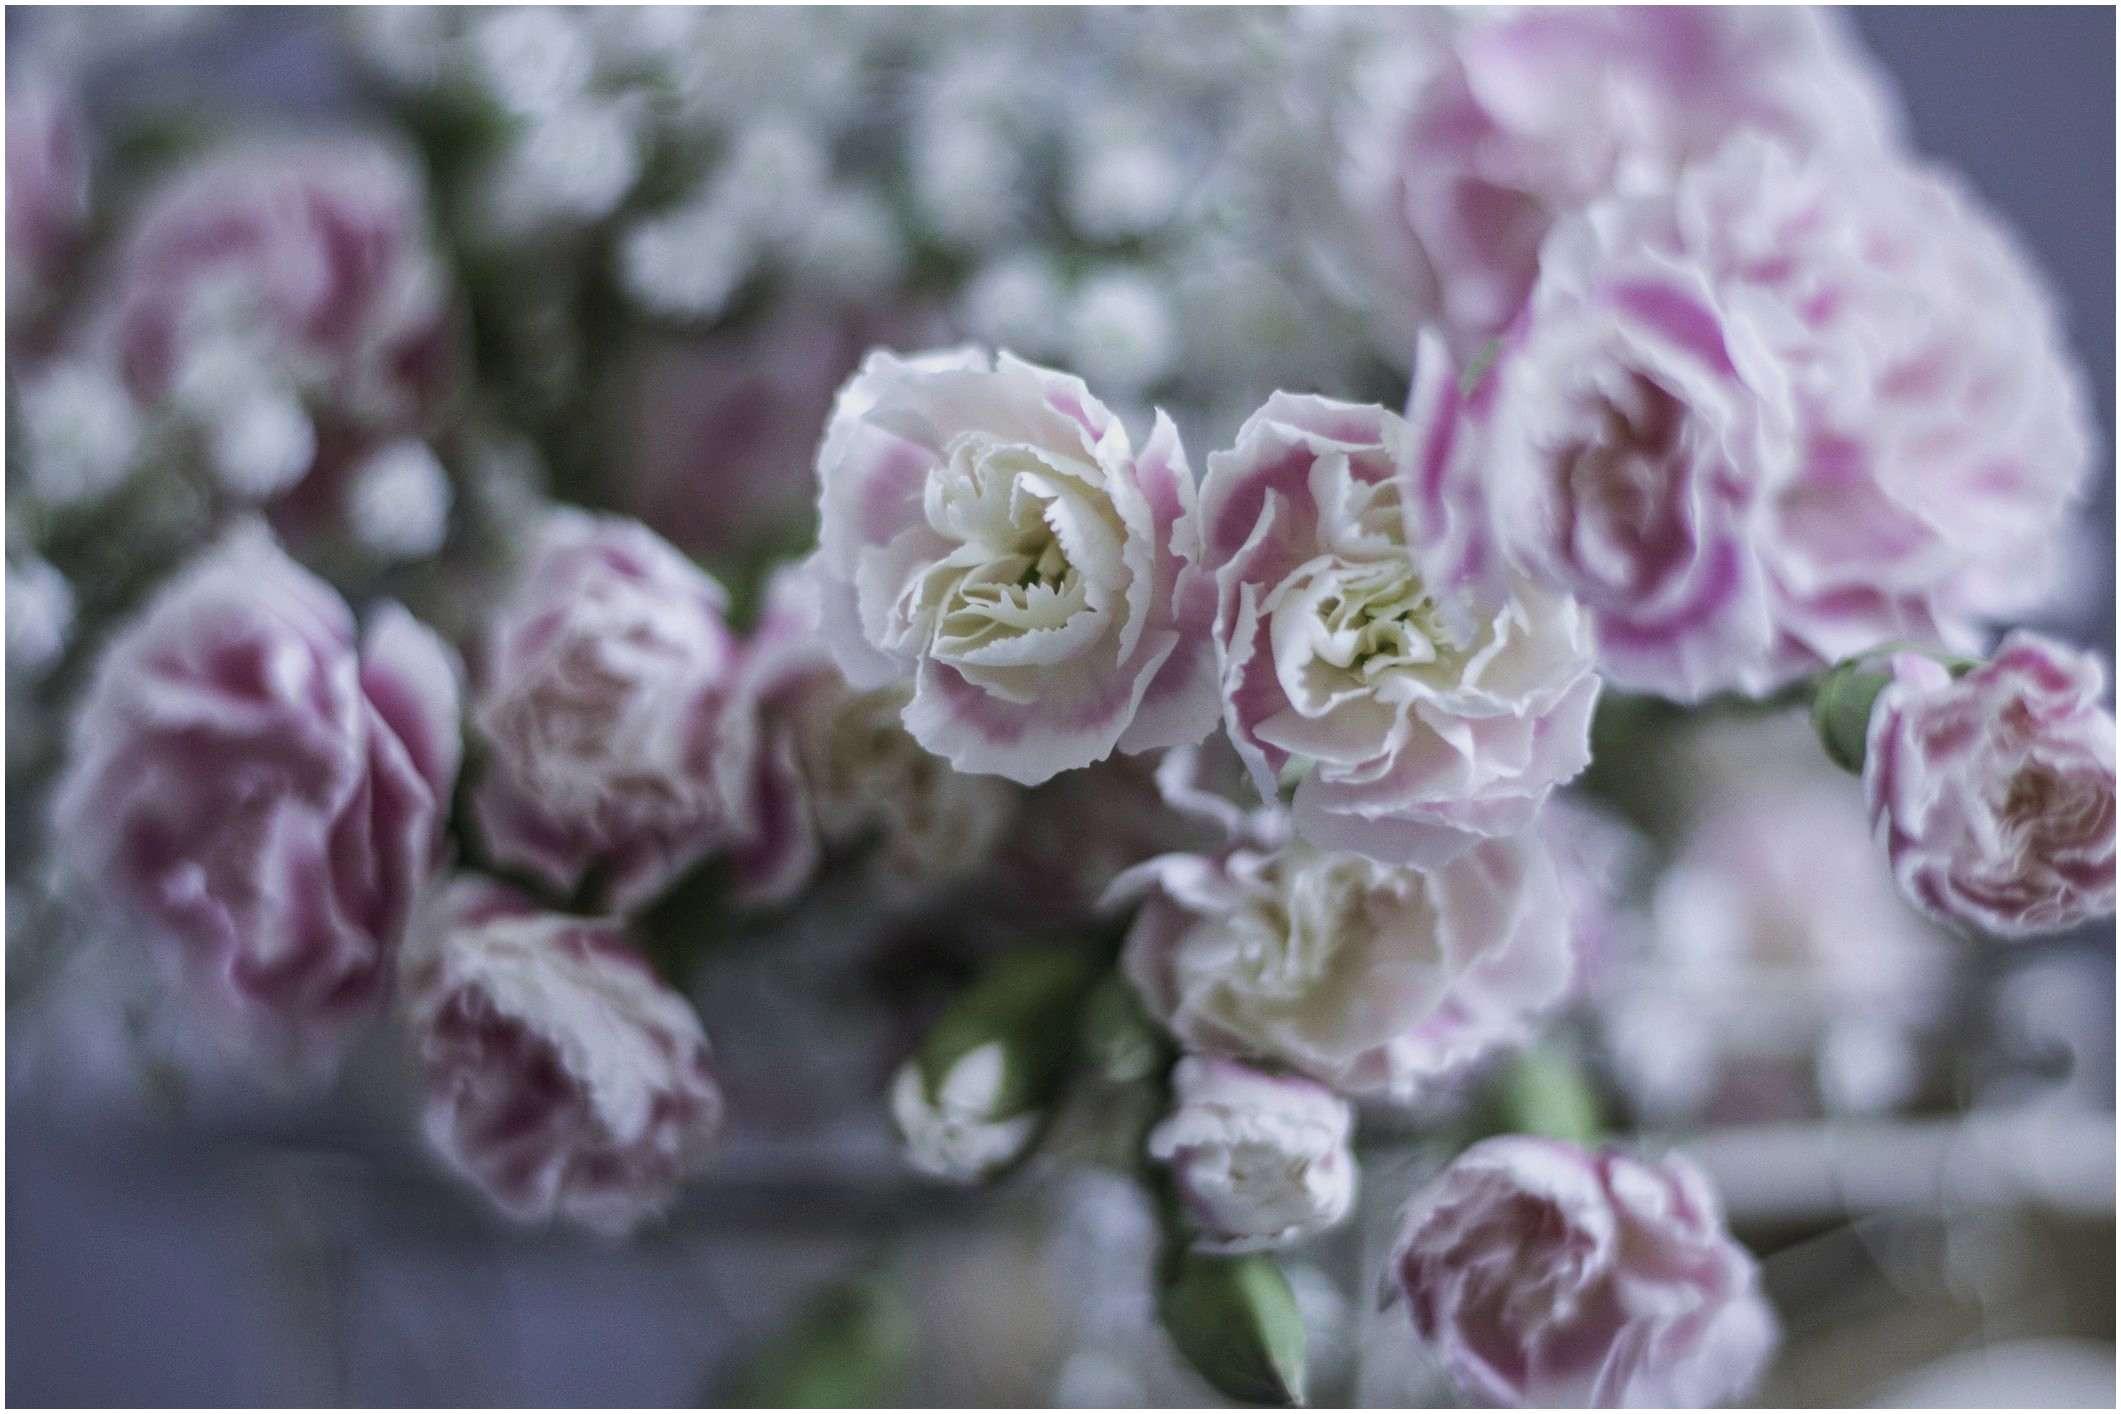 Garden Roses wholesale Best Option Ways to Save Money Your Wedding Flowers 25 Classy Garden